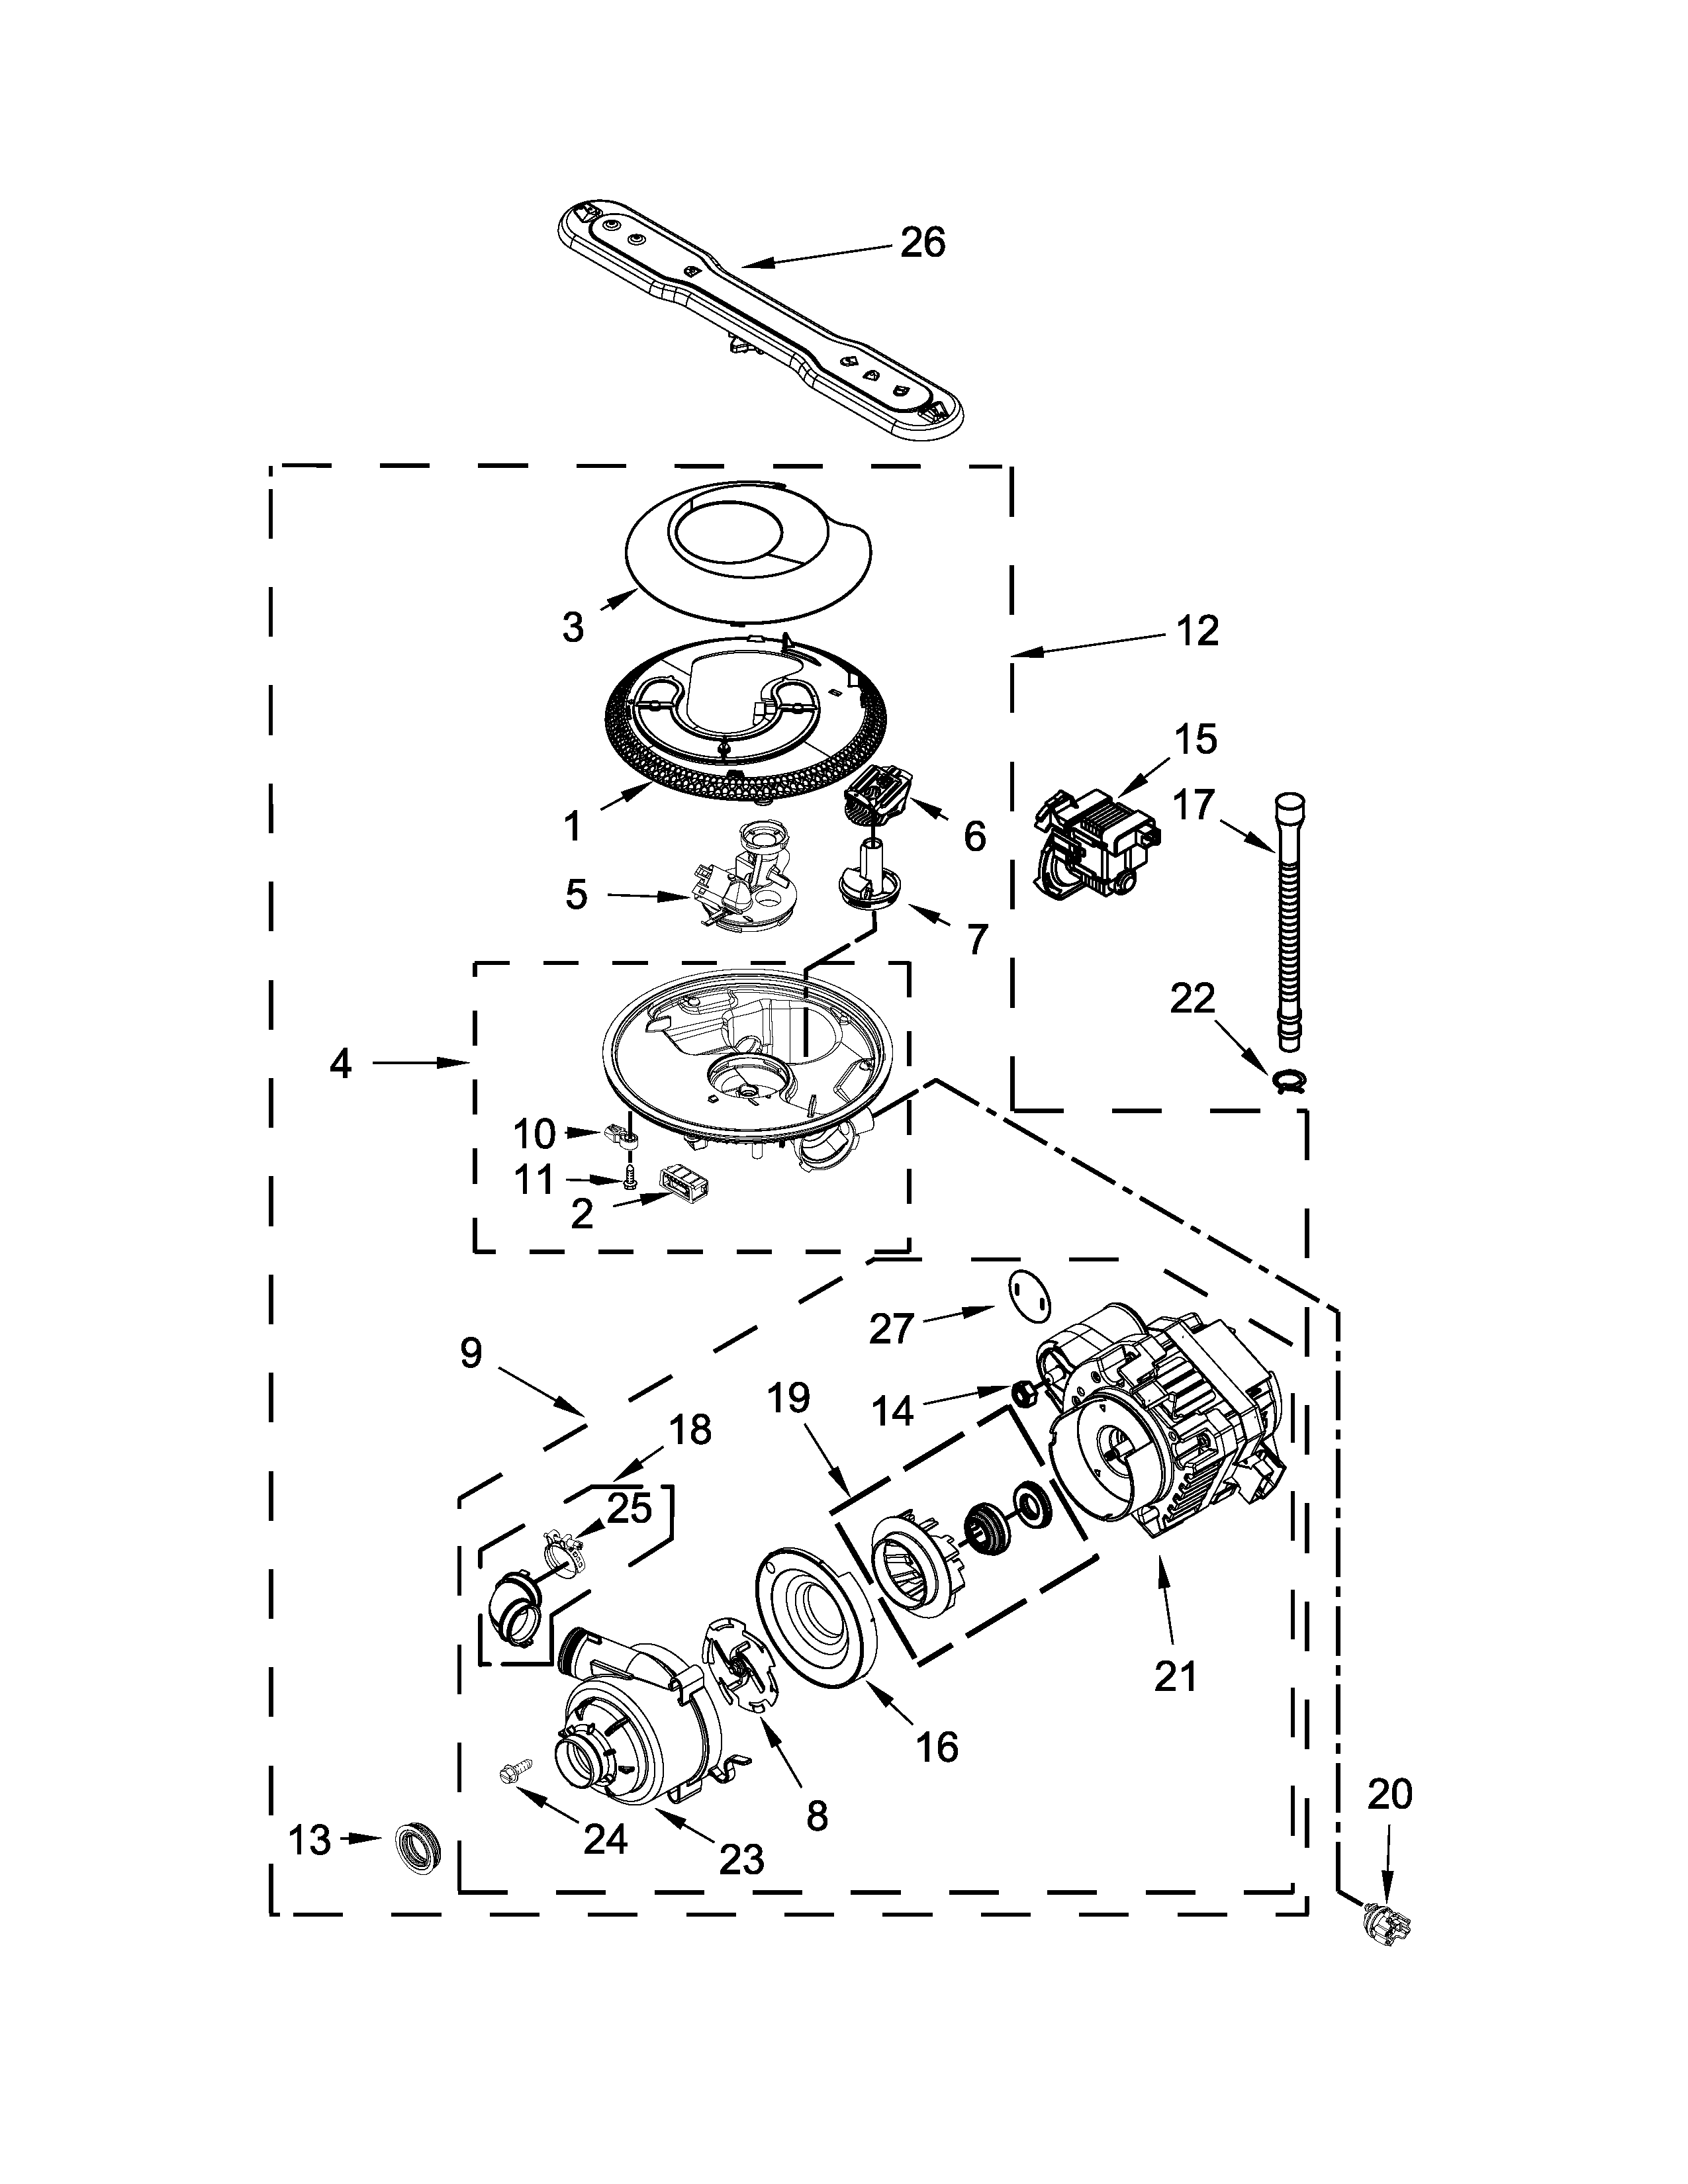 Maytag Dishwasher Manual Quiet Series 200